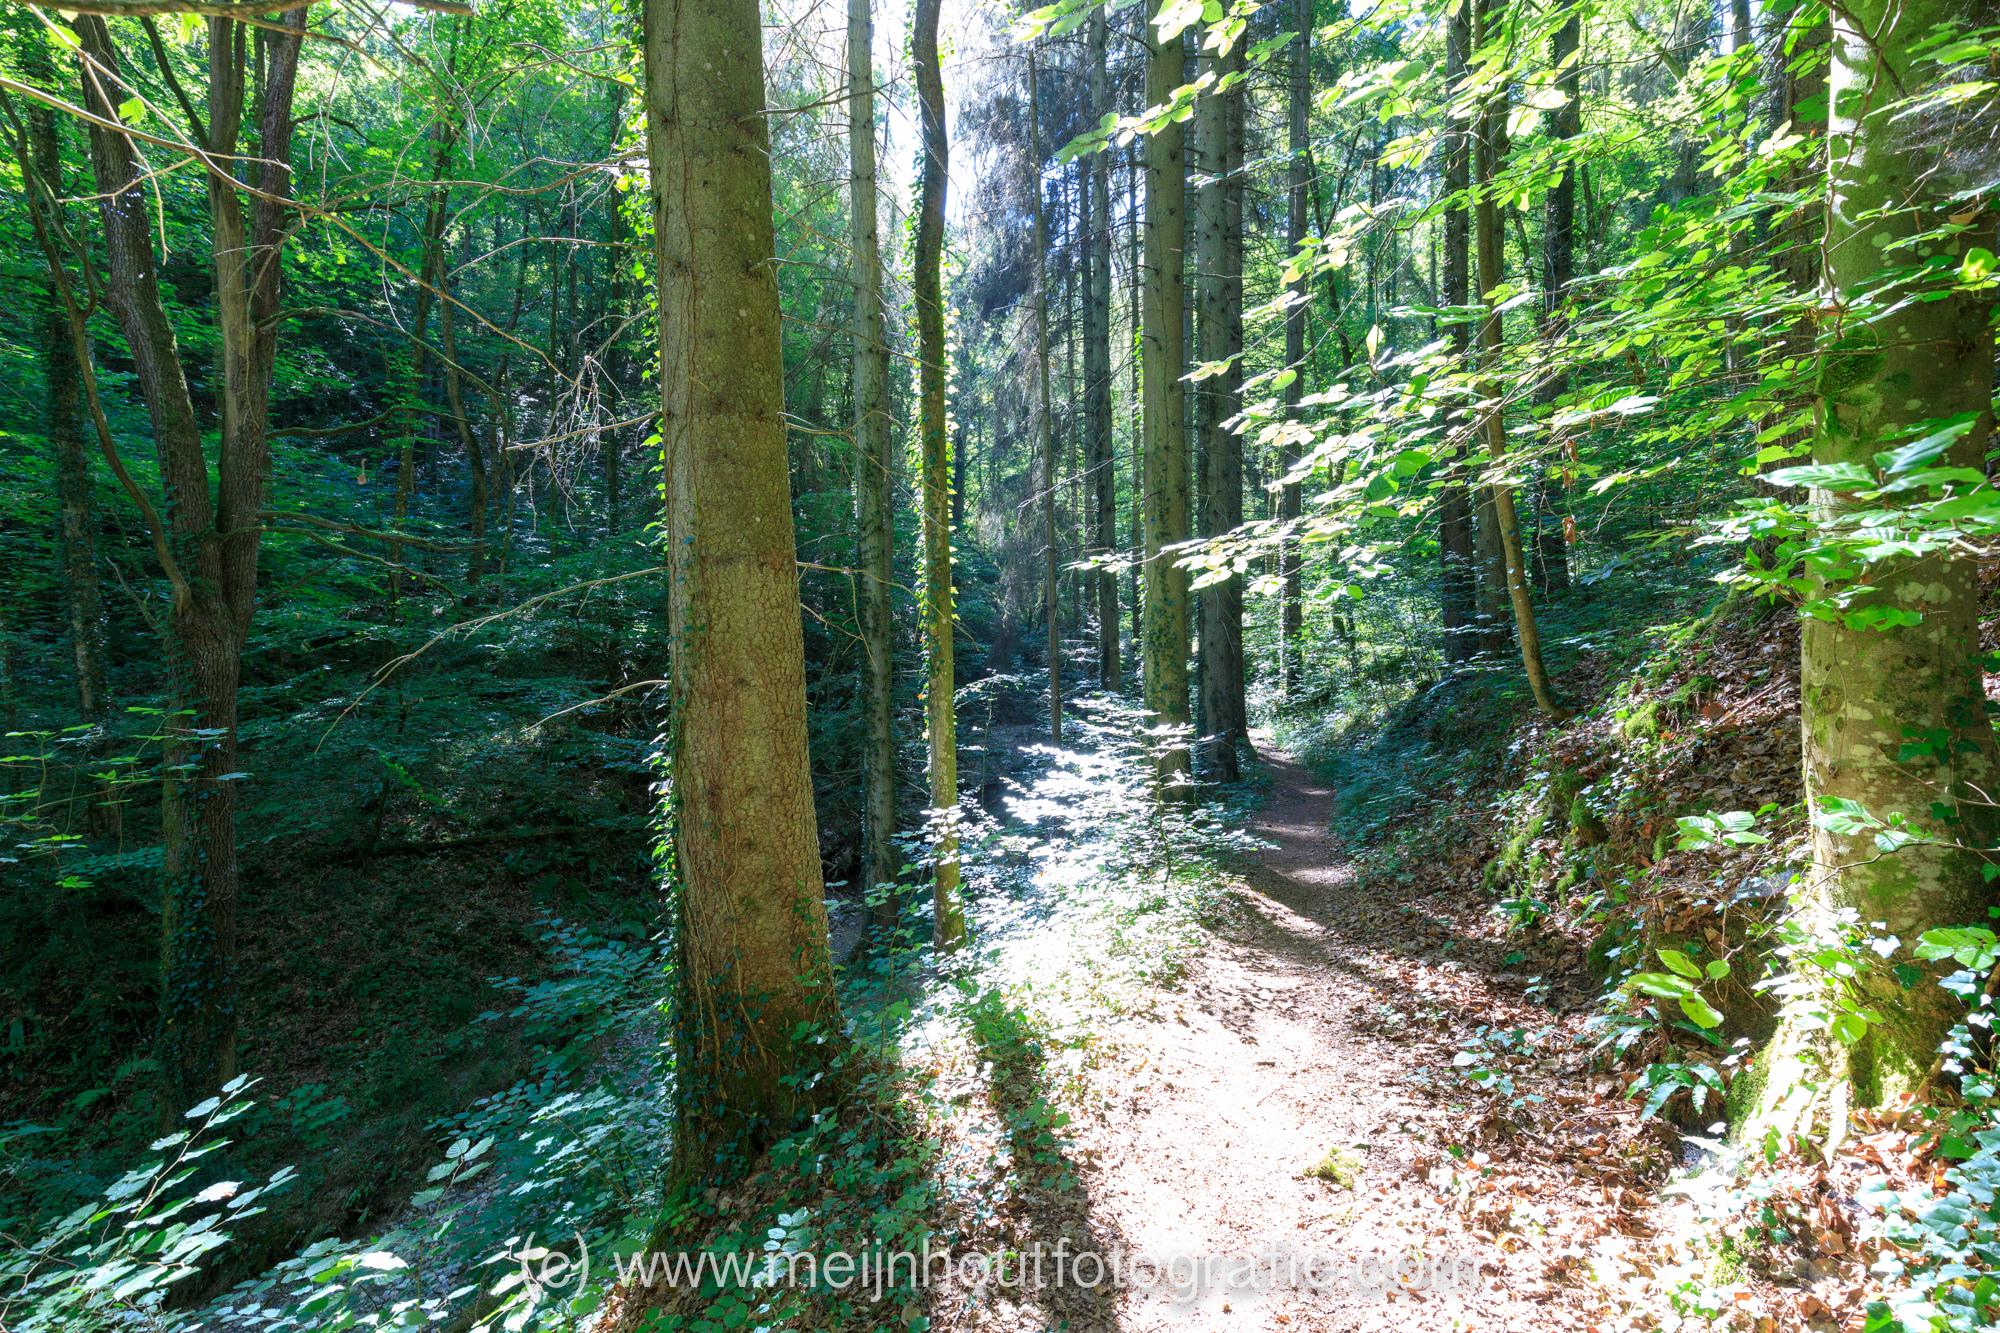 20180730-_MG_9678 Camping Sy Ardennen Belgium.jpg